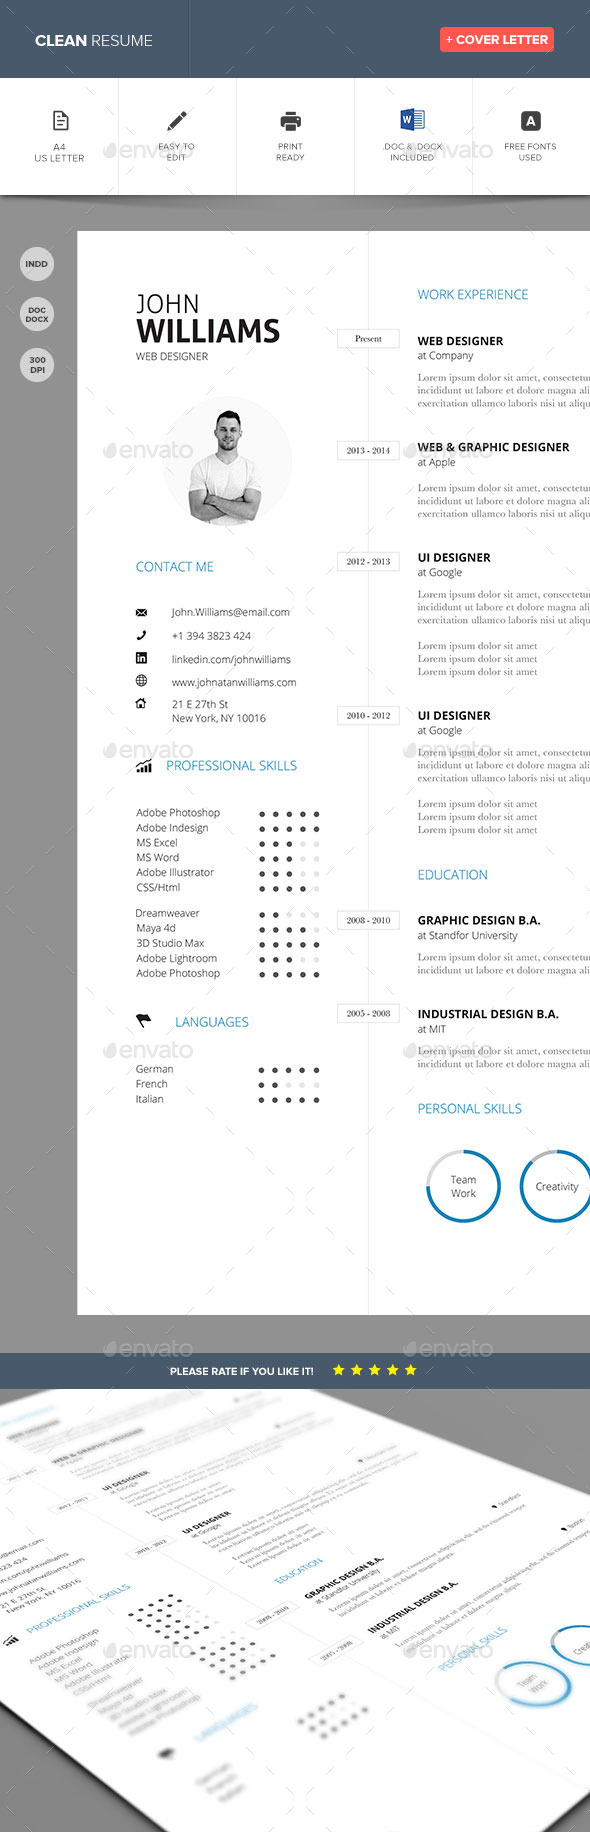 GraphicRiver Clean Resume Vol 3 9846439